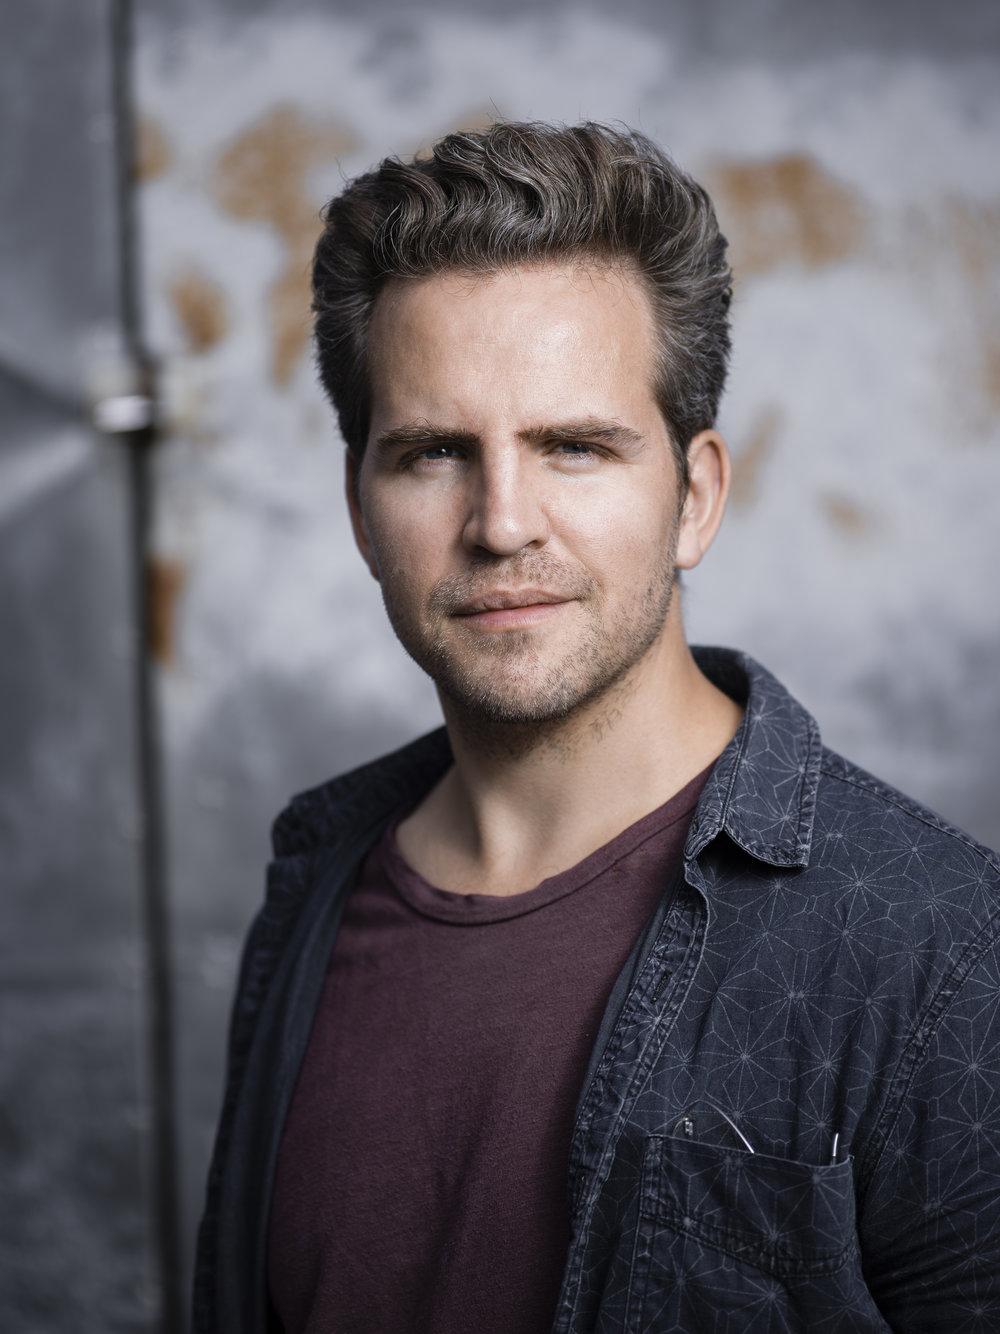 Daniel James Aadne